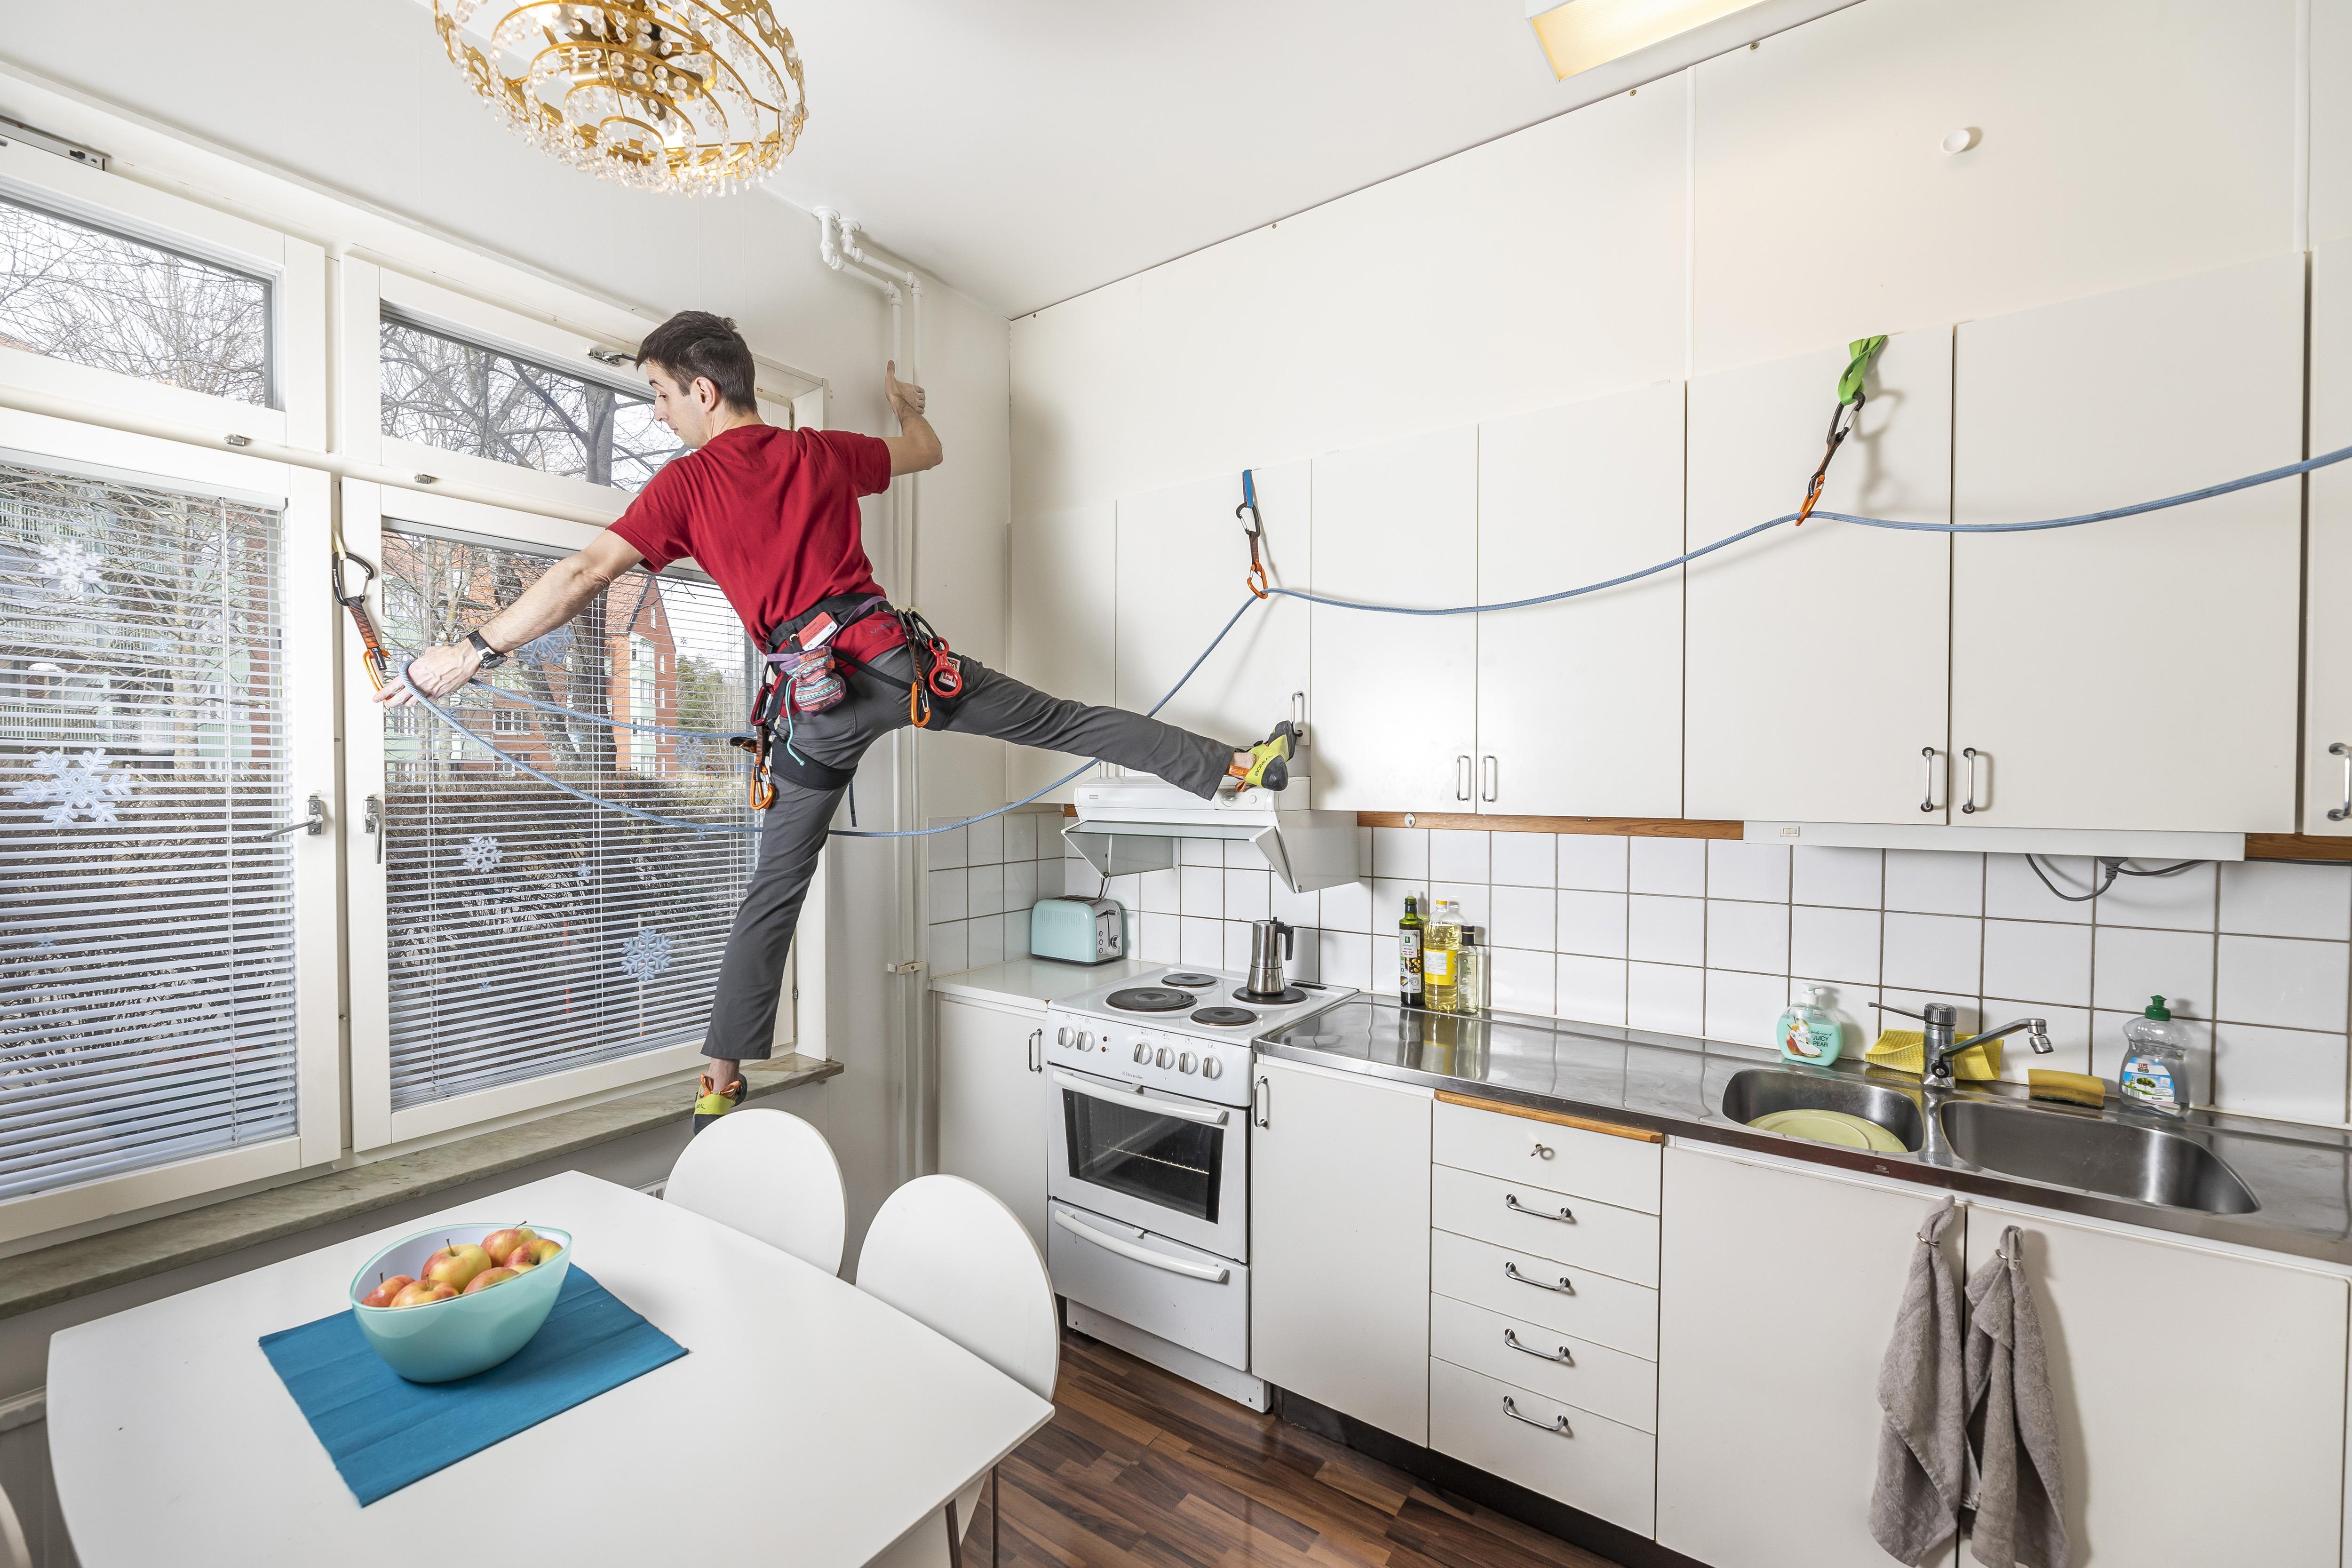 'Outdoor sports photographer in quarantine'. Stockholm, Sweden